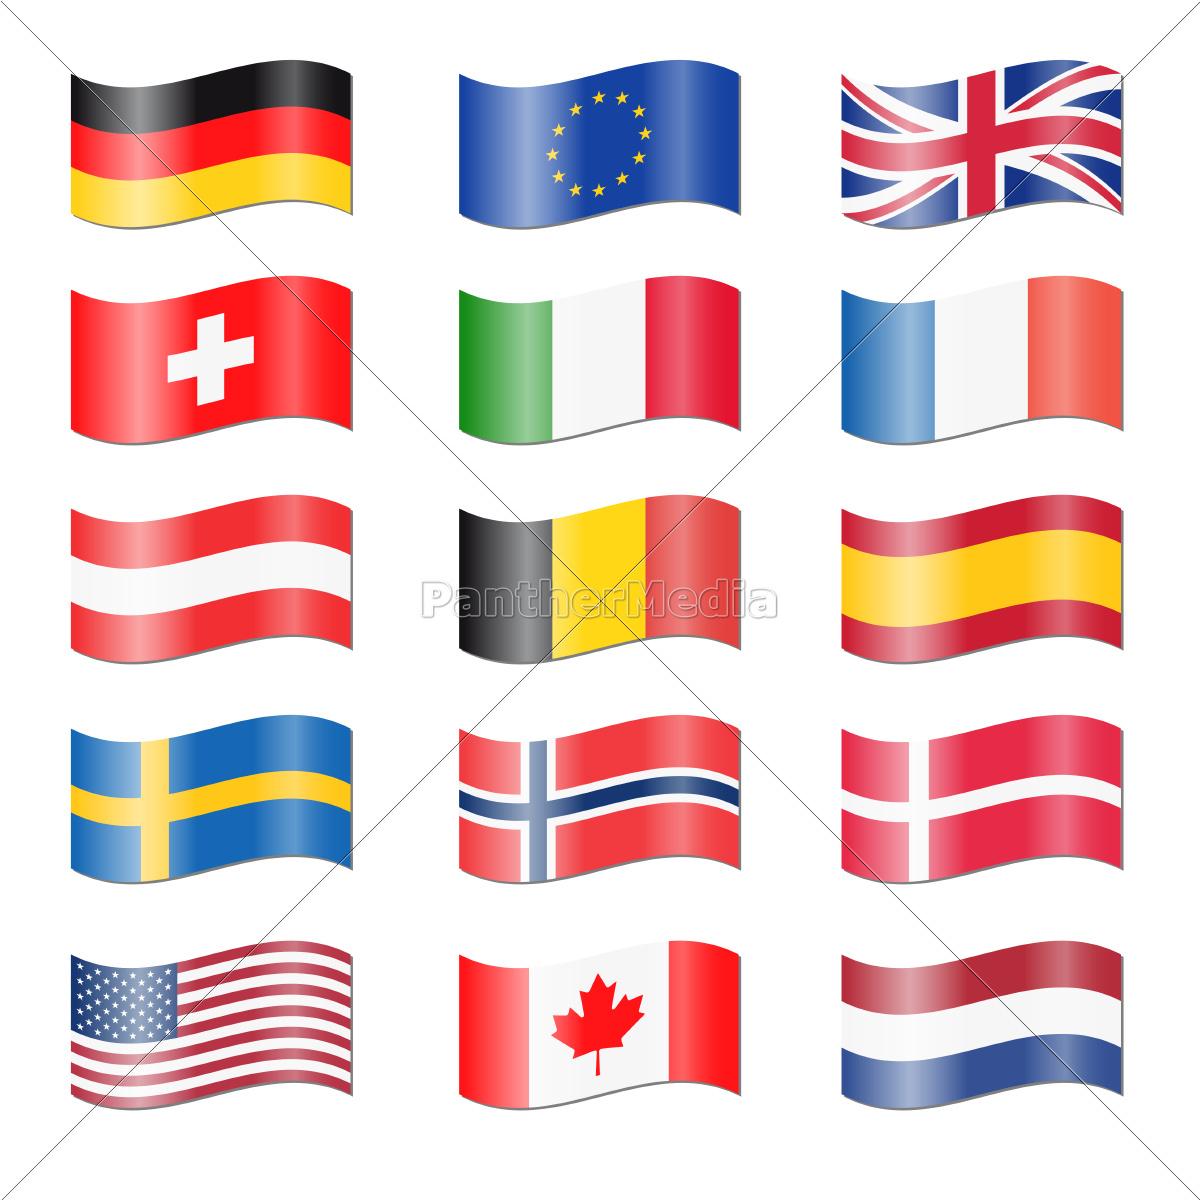 Lizenzfreies Foto 9524972 - Set Länder Flaggen Geschwungen in Flaggen Der Eu Länder